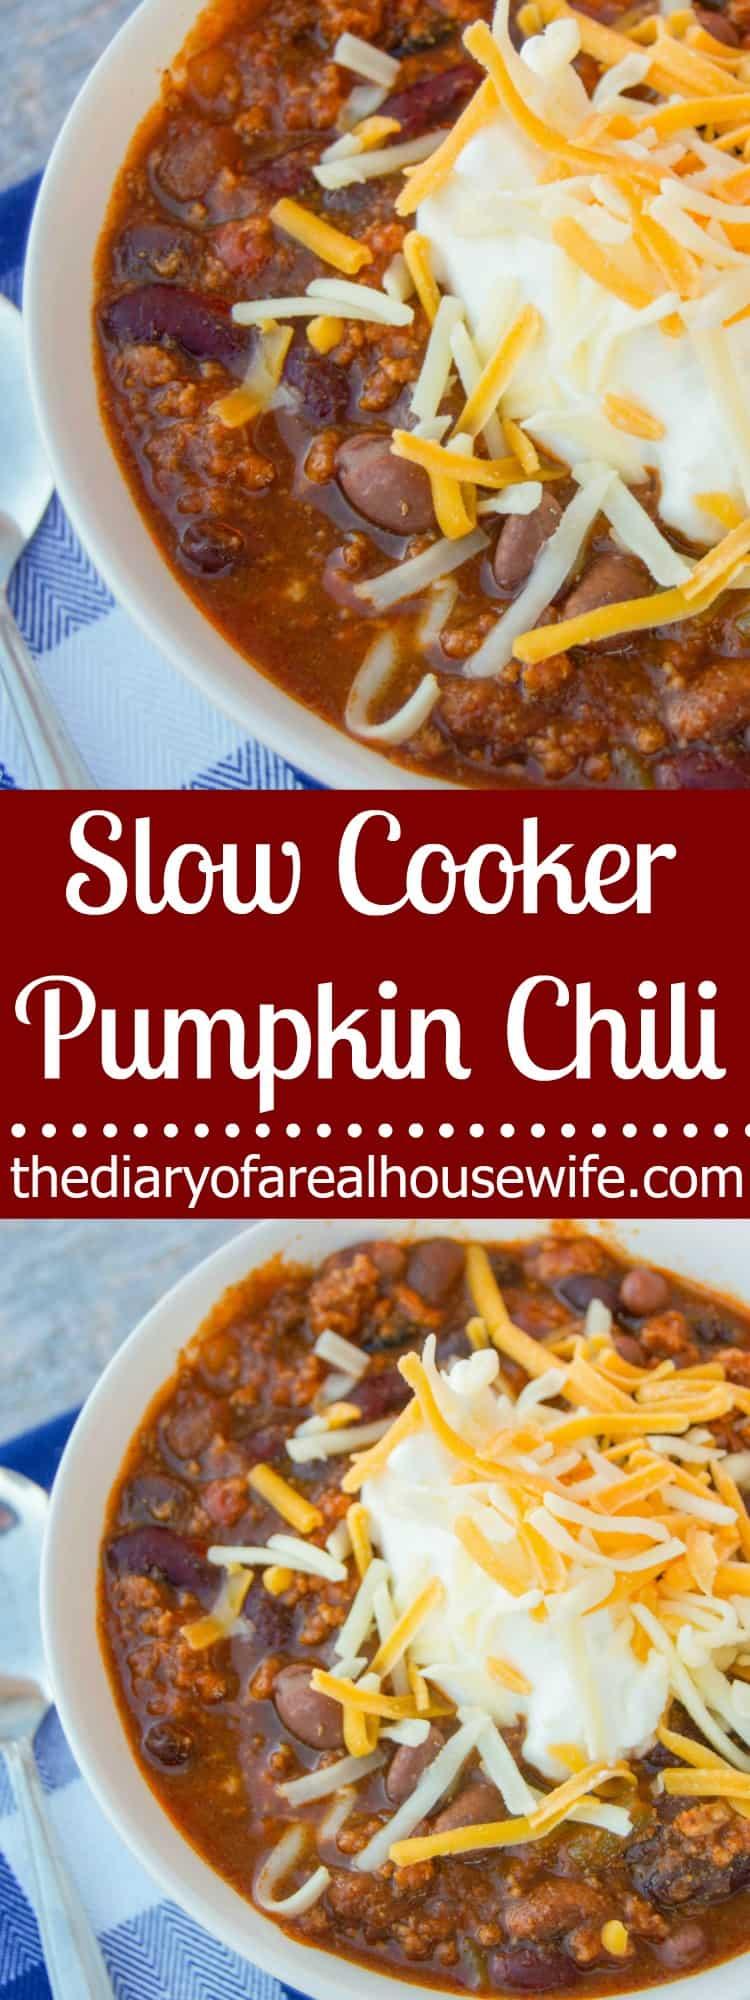 slow-cooker-pumpkin-chili